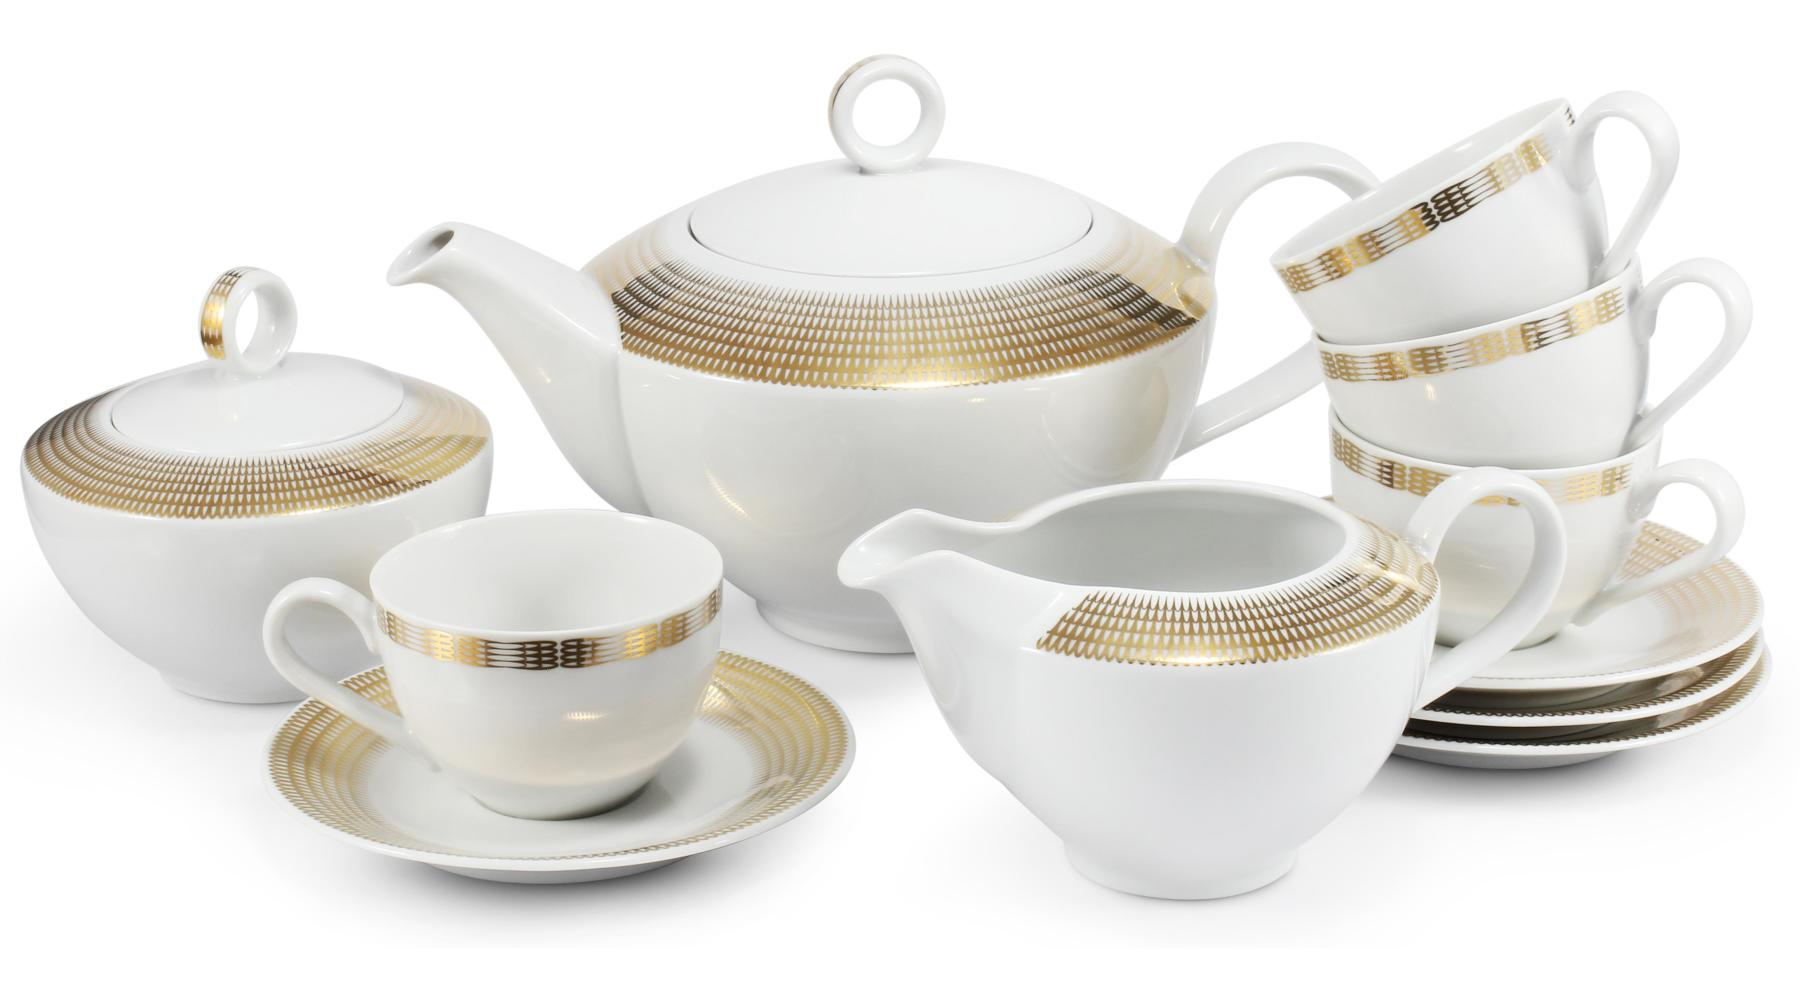 Teeservice 11-teilig Goldene Engelsflügel